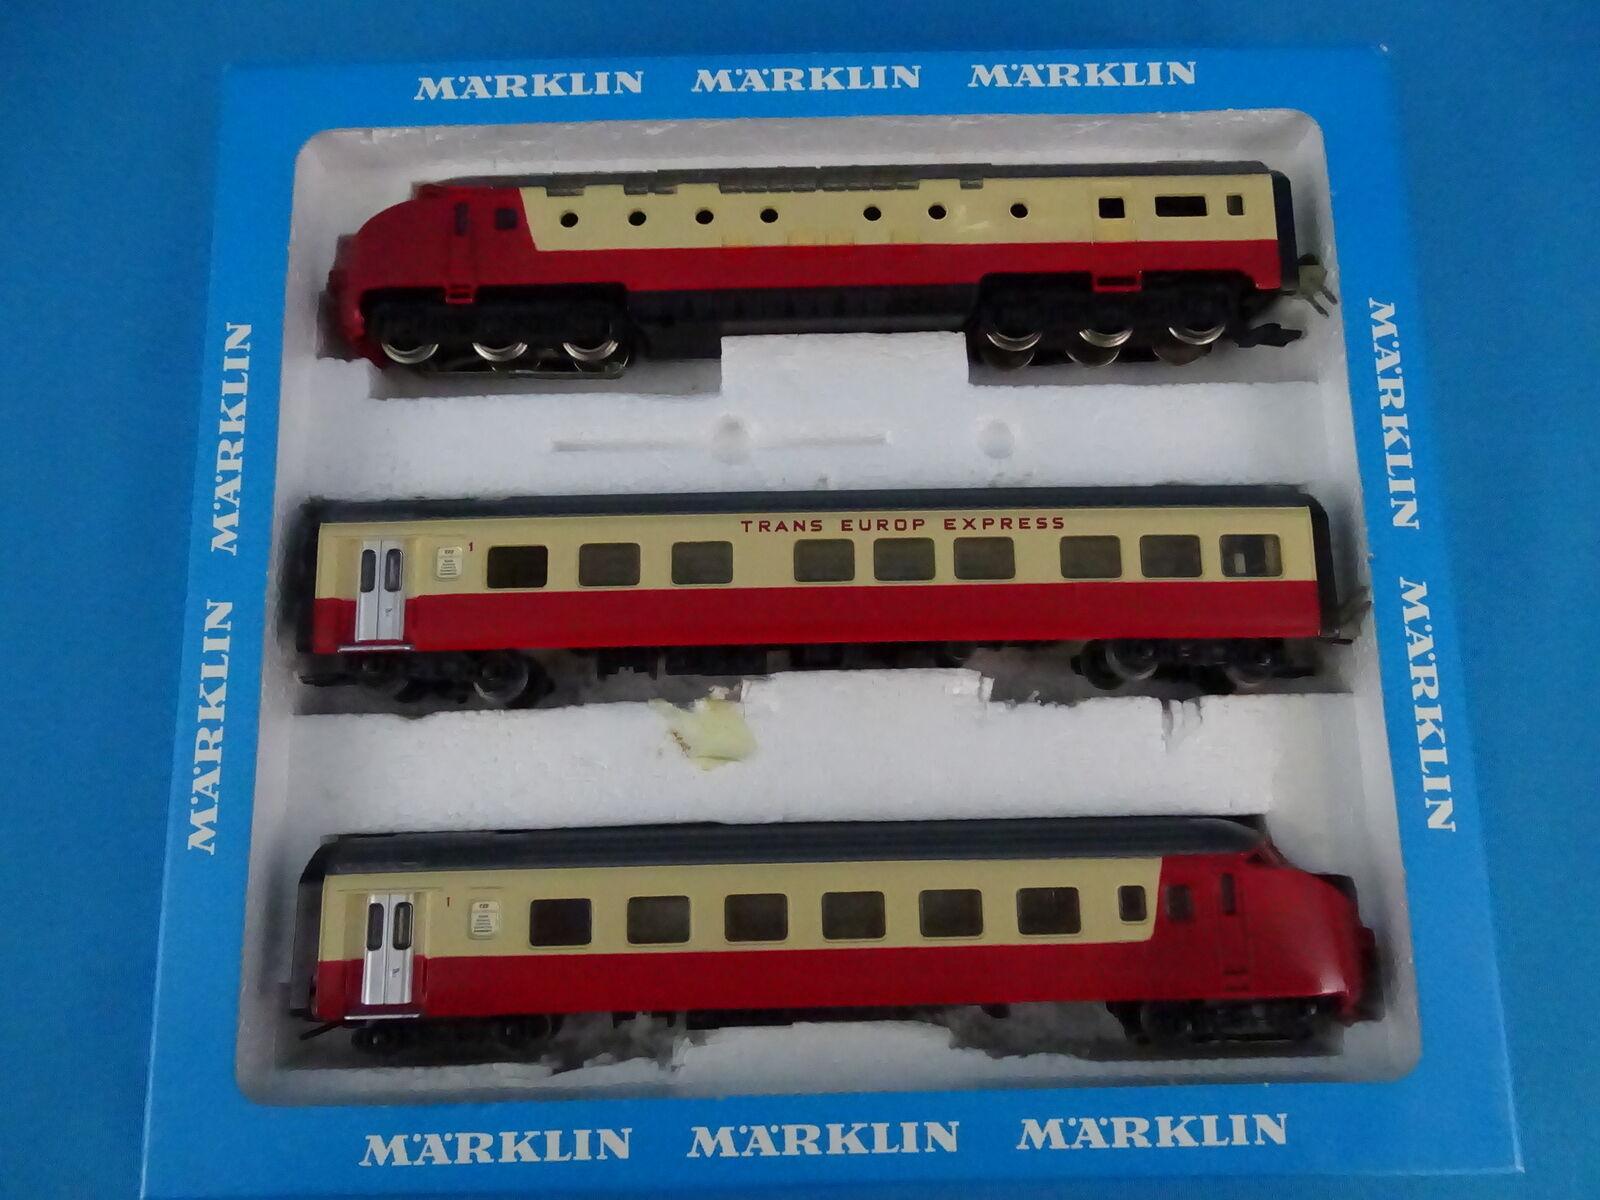 Marklin 3071 NS SBB Tee Diesel Train Set Edelweiss Express versión 1 rosso-Marfil